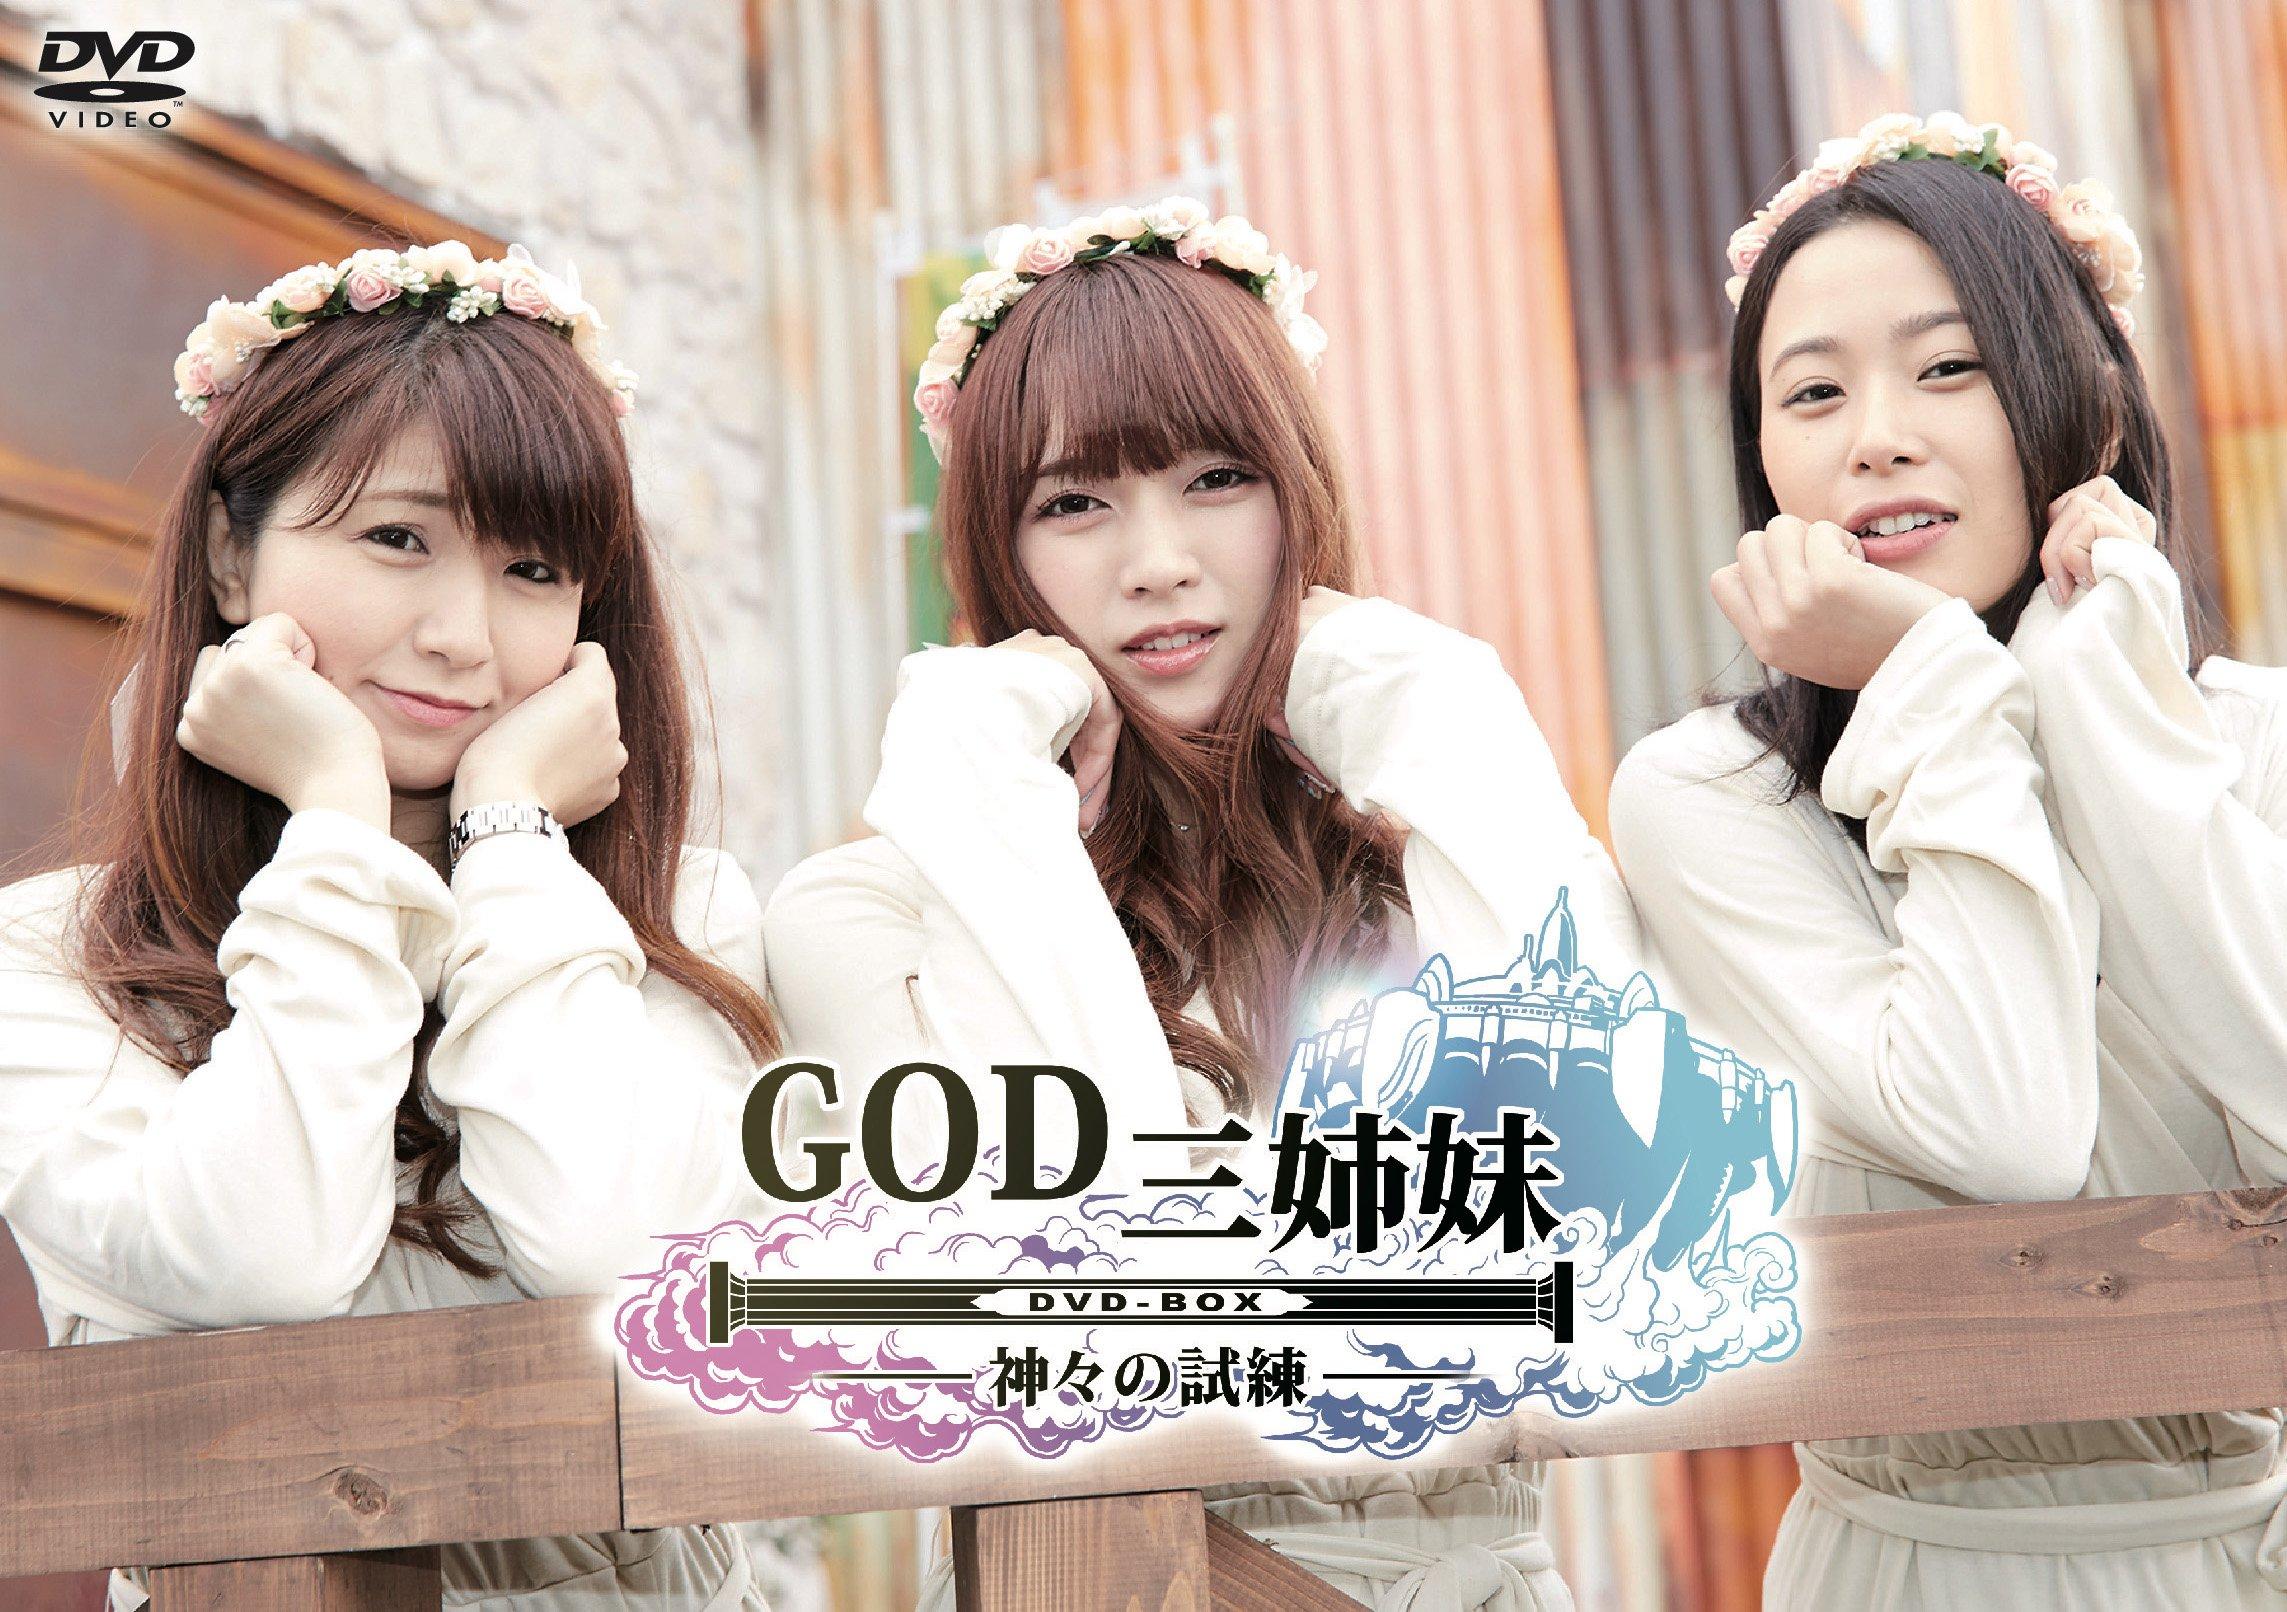 GOD三姉妹 DVD-BOX -神々の試練- (<DVD>) | |本 | 通販 | Amazon